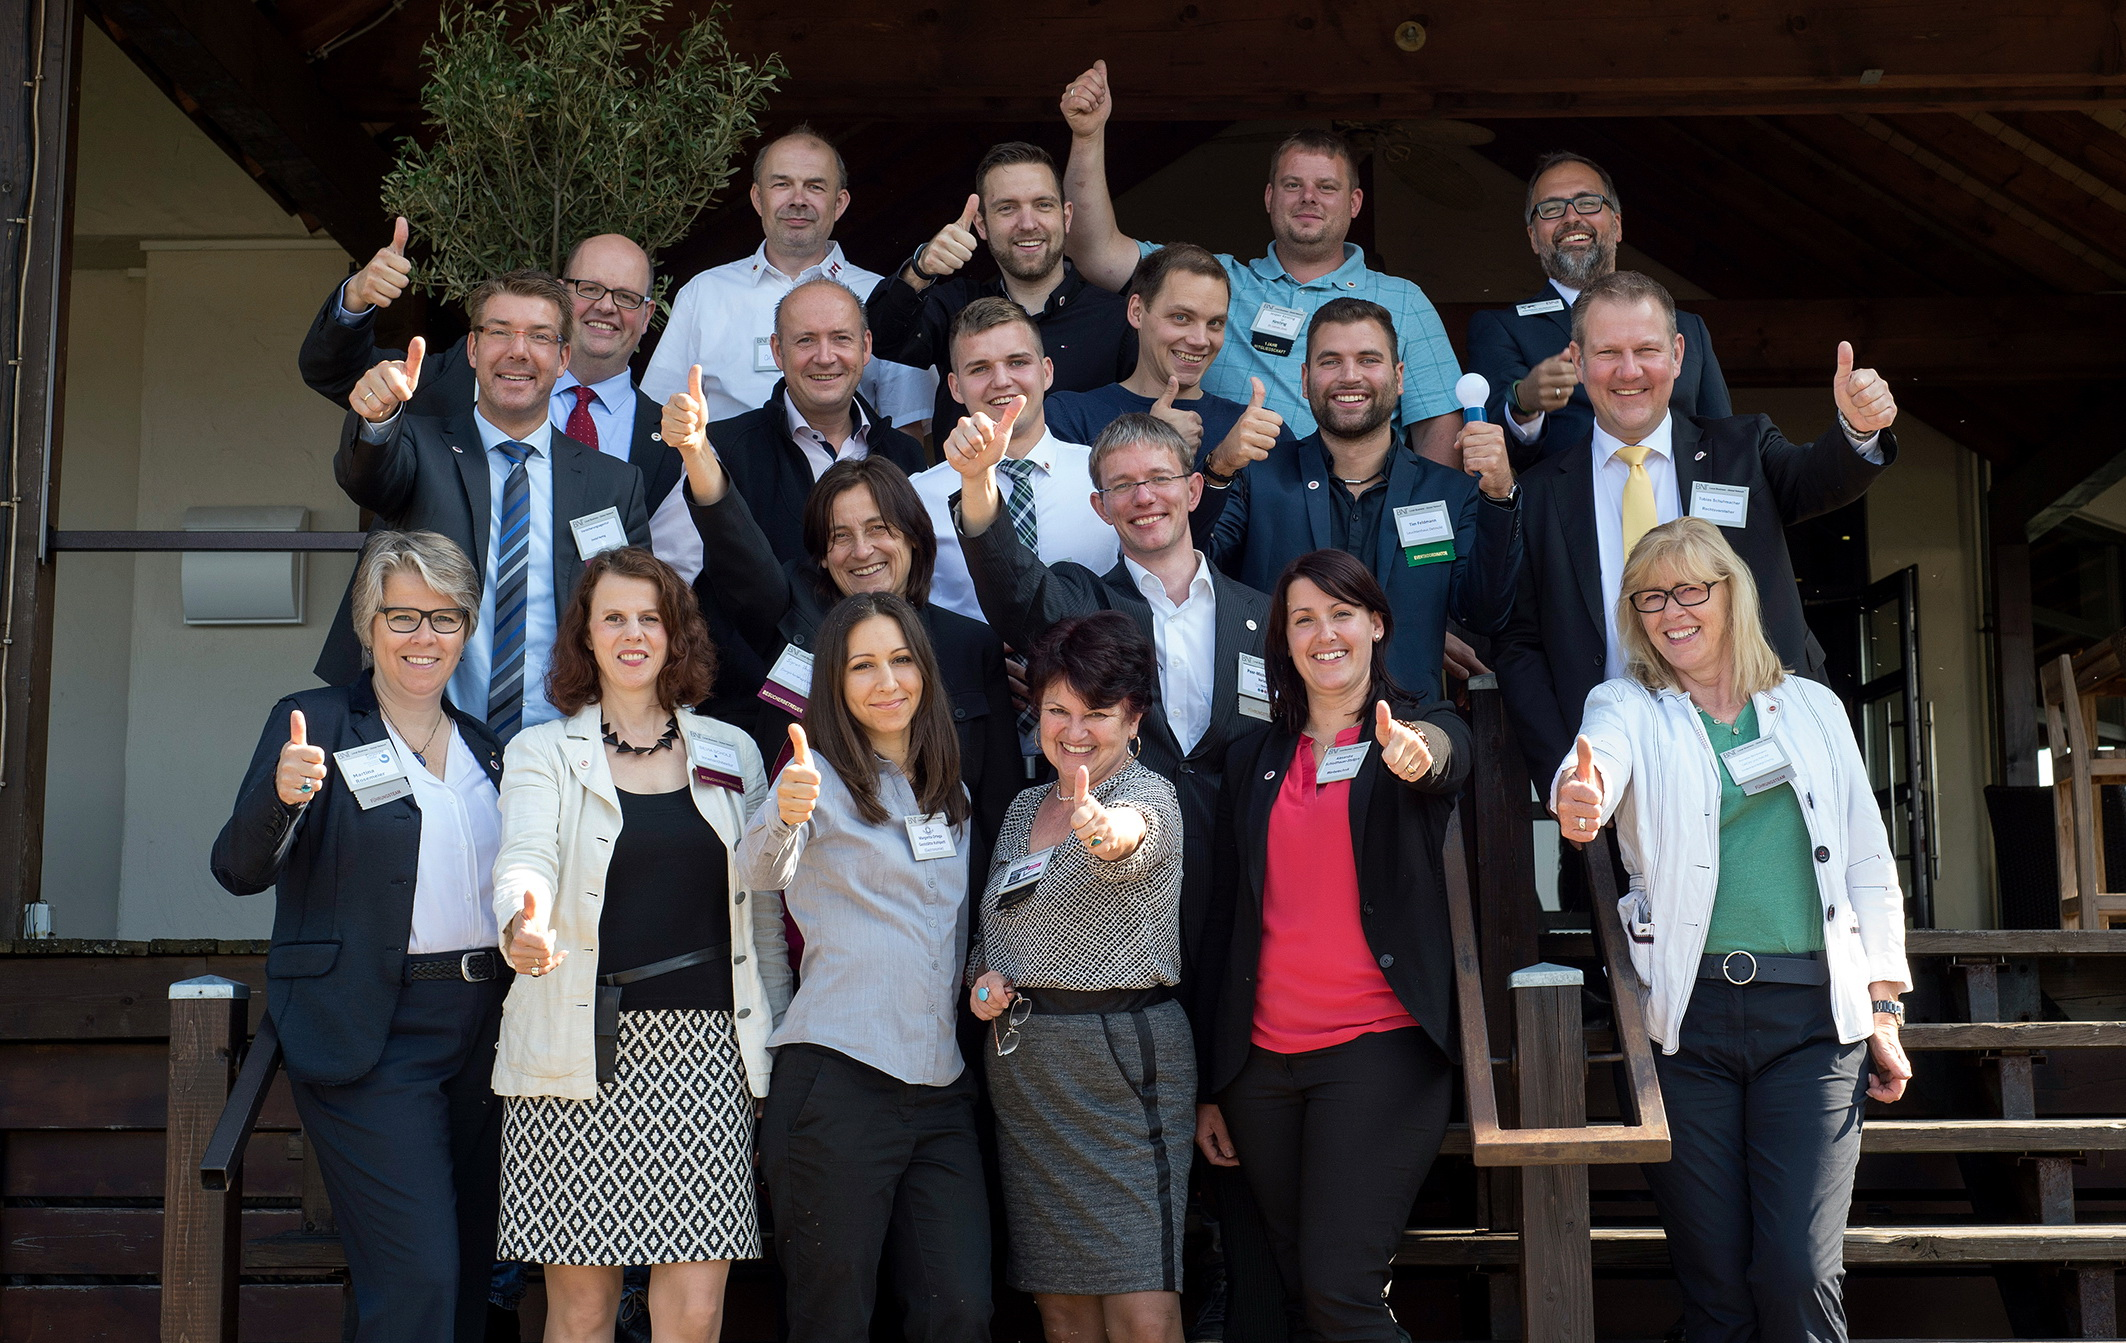 Gründungsmitglieder des BNI-Unternehmerteams Residenz in Detmold. Untere Reihe links: Chapterdirektorin Martina Rosemeier. (Foto: Jutta Jelinski | www.fotografie-jelinski.de)